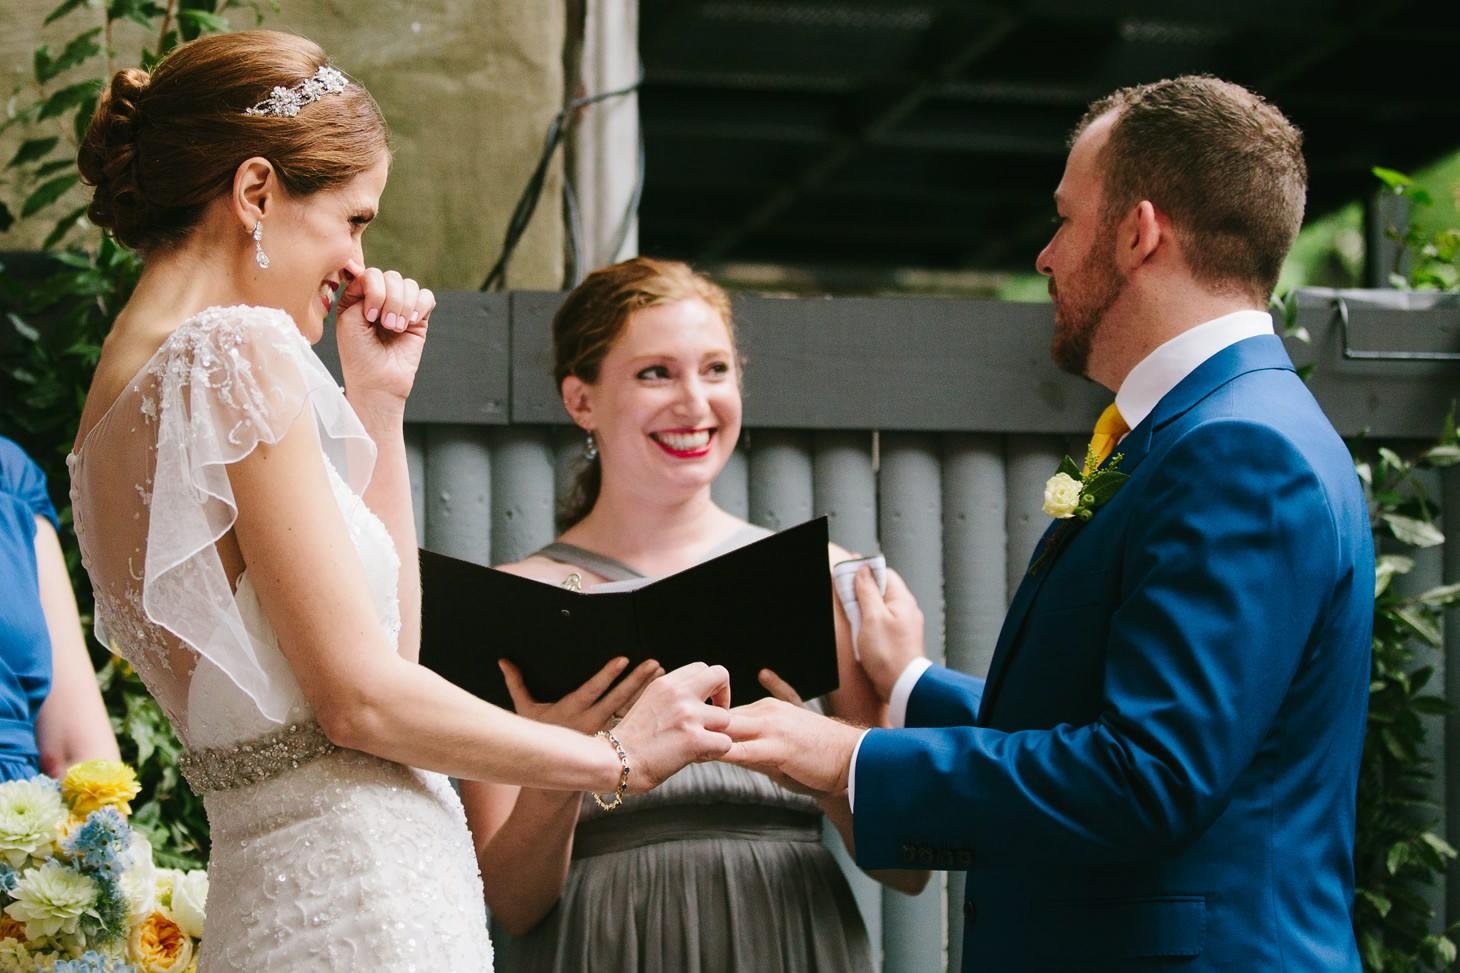 brooklyn-restaurant-wedding-nyc-weddingi-photographer-smitten-chickens07.jpg